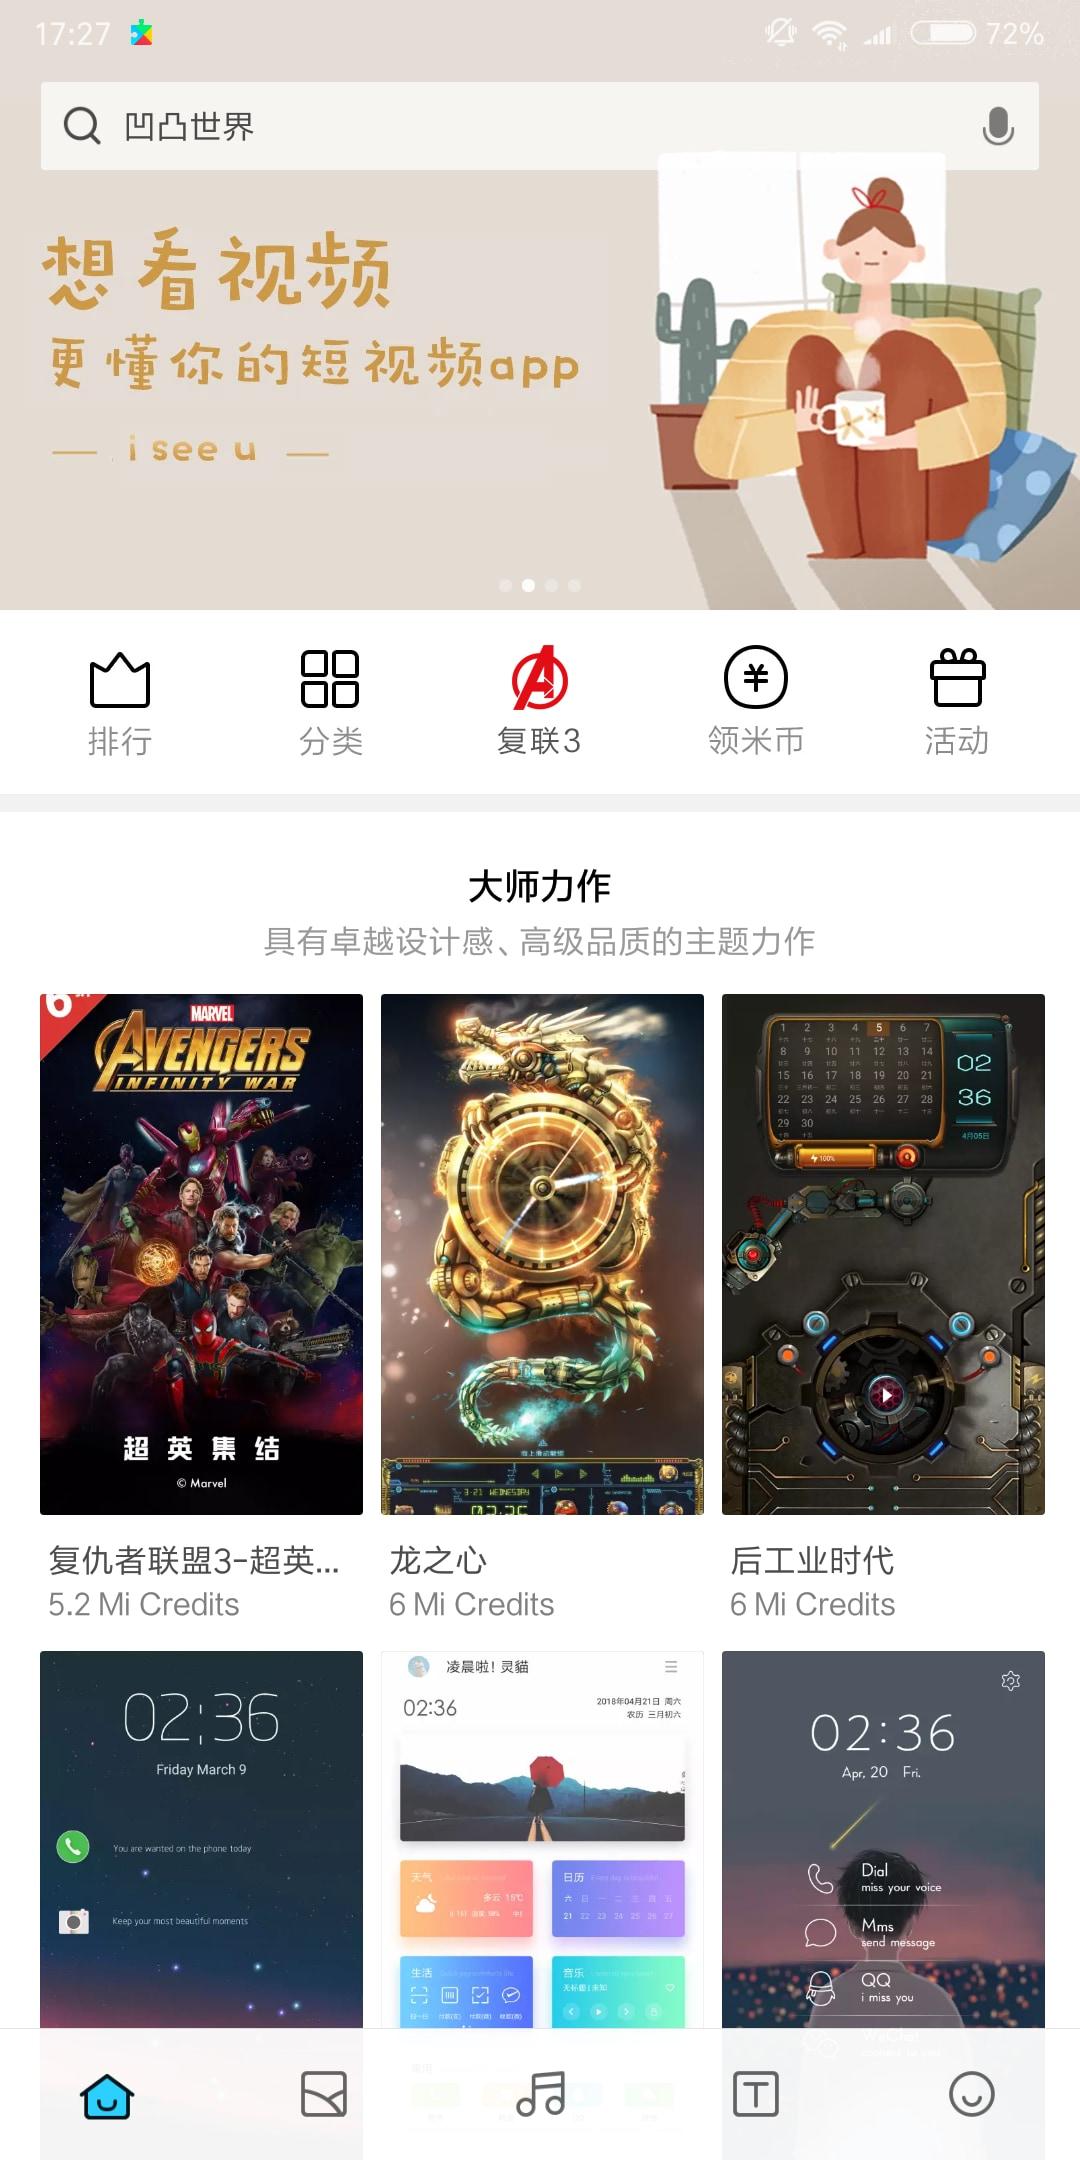 Screenshot_2018-05-03-17-27-57-832_com.android.thememanager